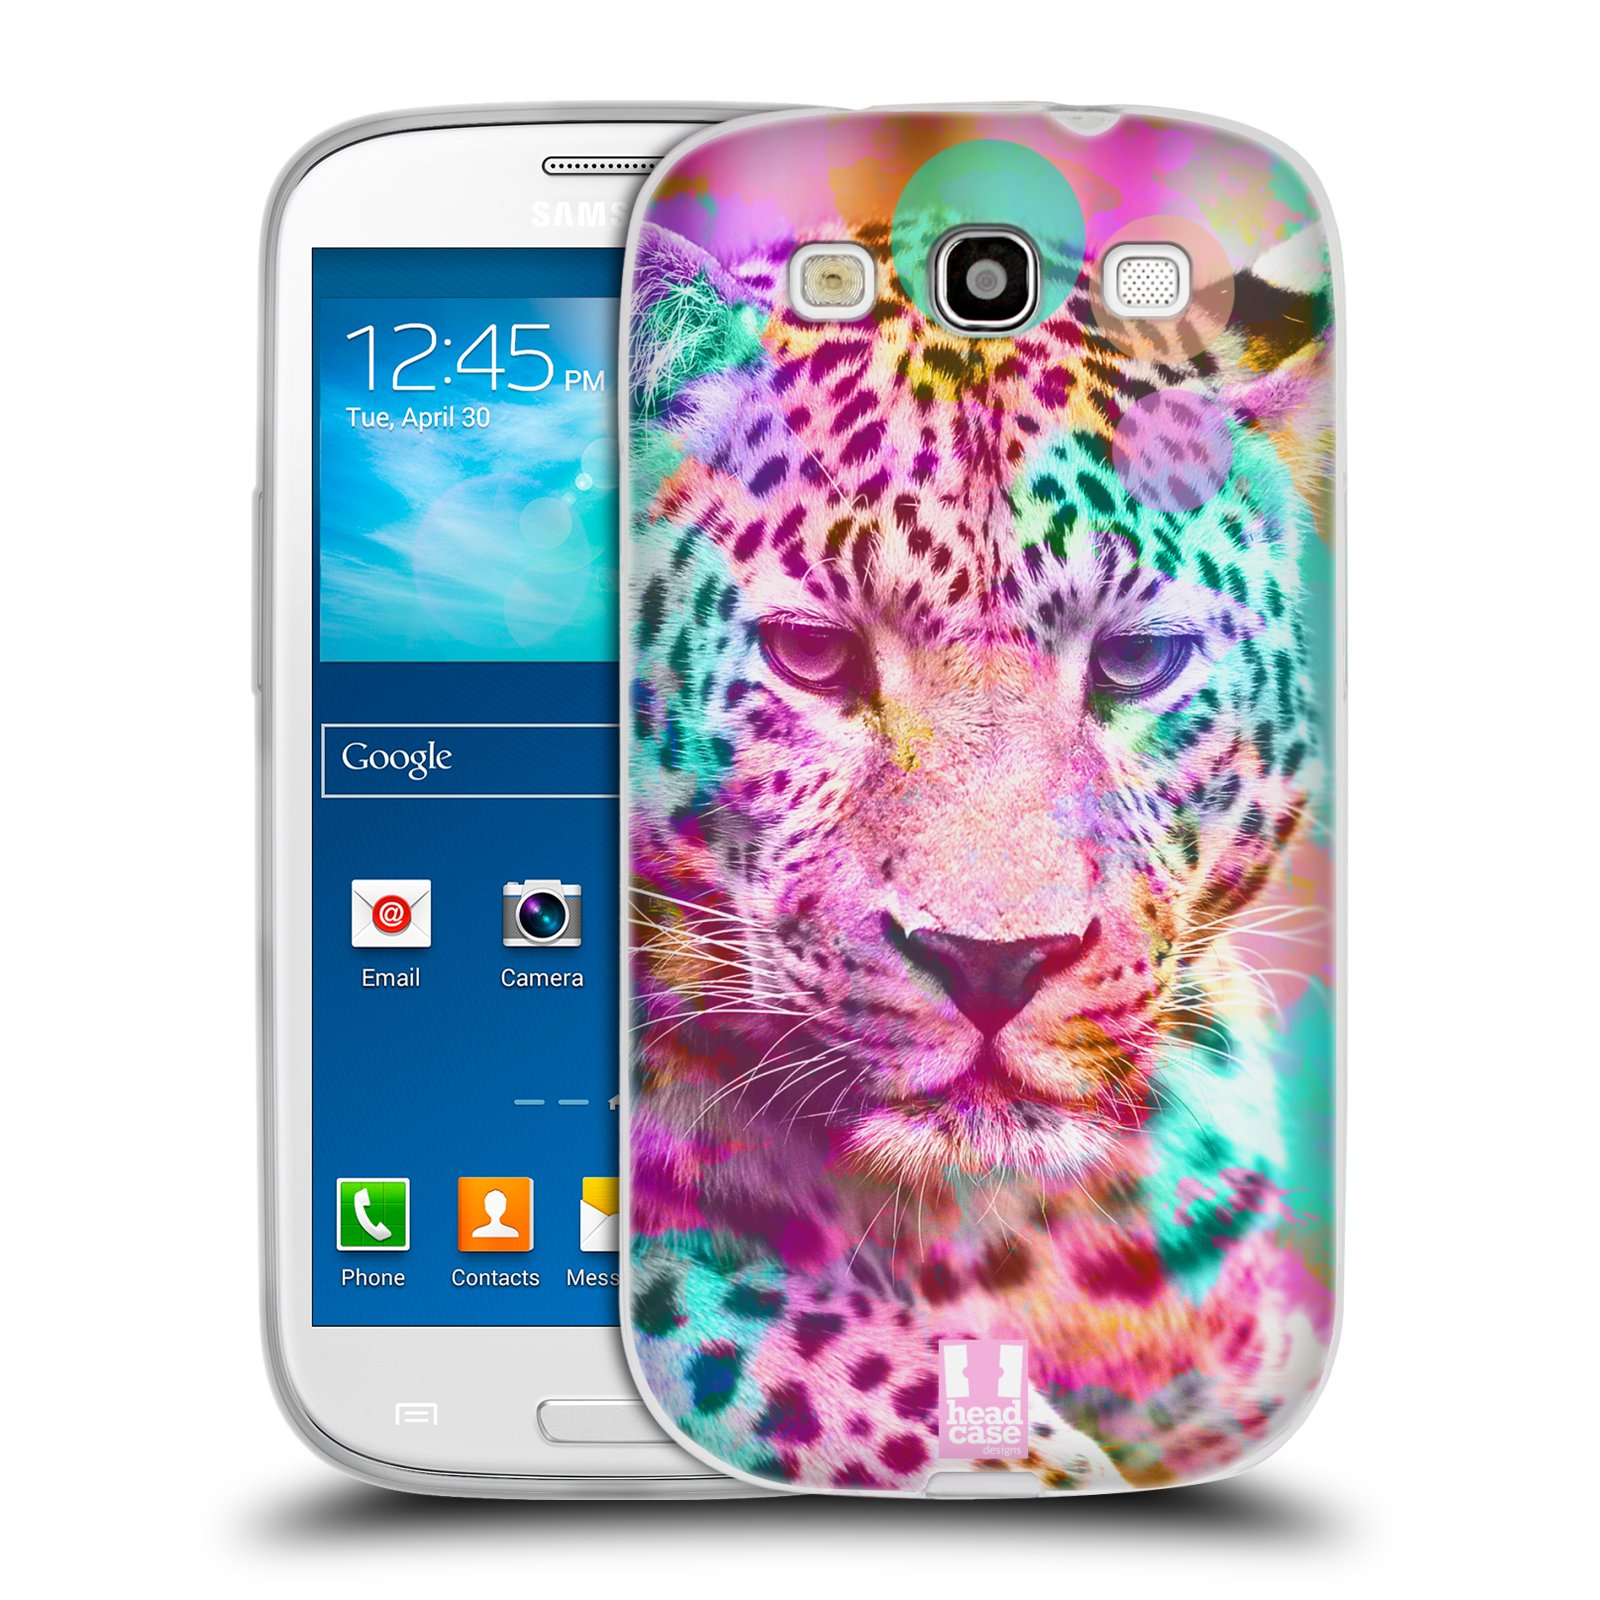 Silikonové pouzdro na mobil Samsung Galaxy S3 Neo HEAD CASE MIX LEOPARD (Silikonový kryt či obal na mobilní telefon Samsung Galaxy S3 Neo GT-i9301i)